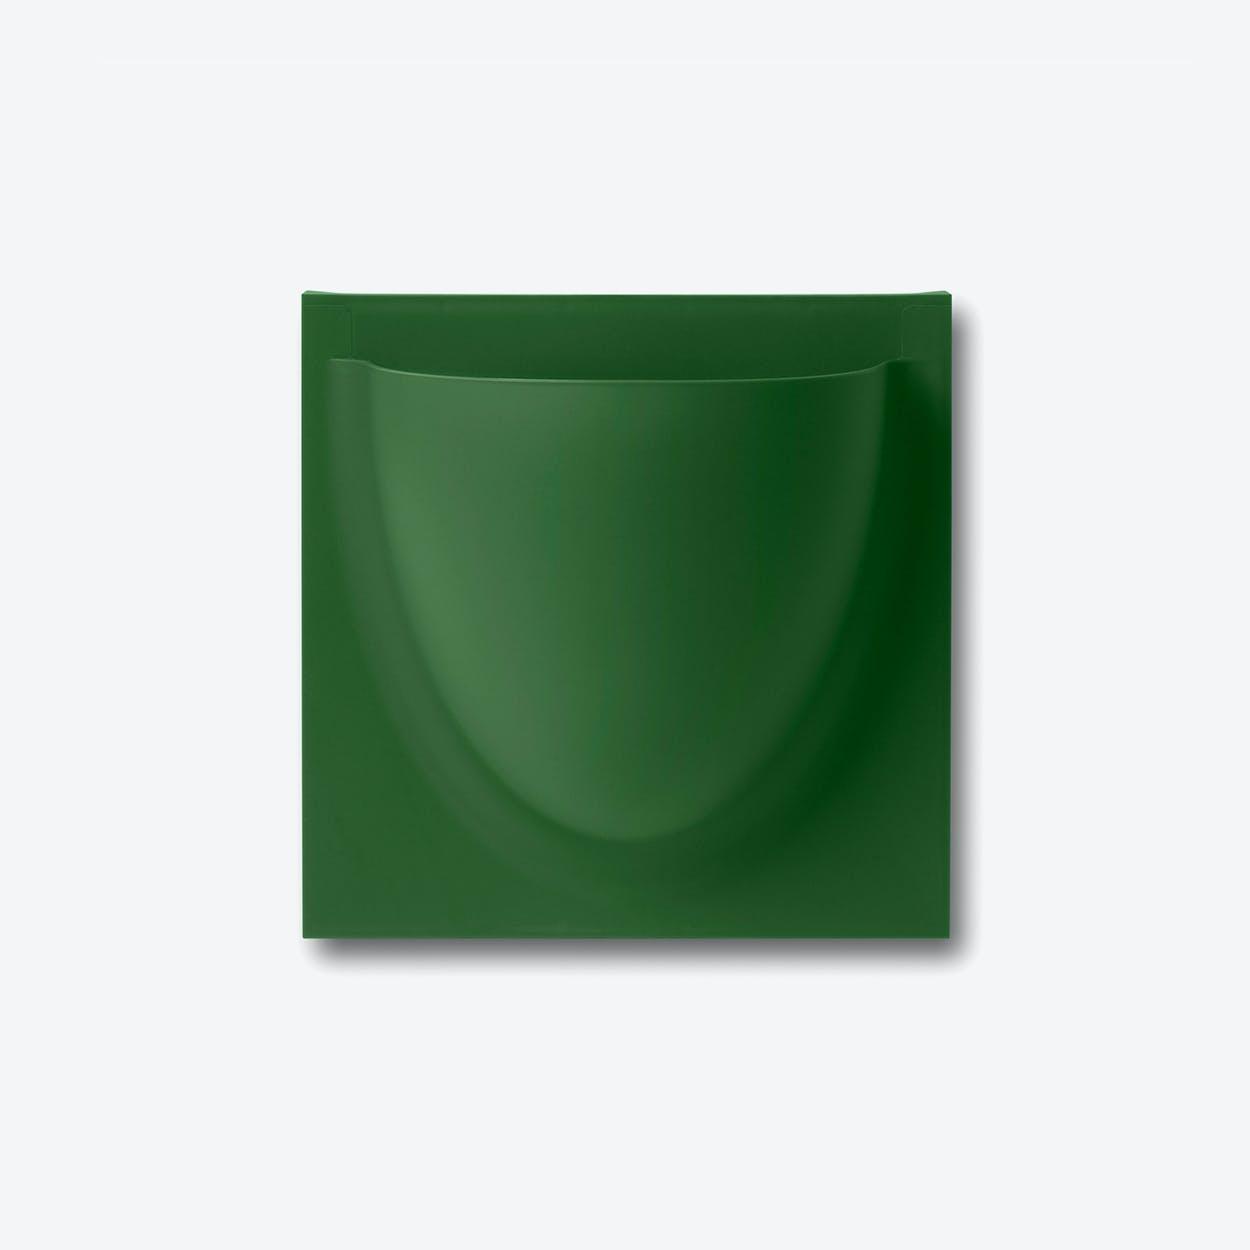 Wall Planter / Jar Mini in Leaf Green (Set of 2)